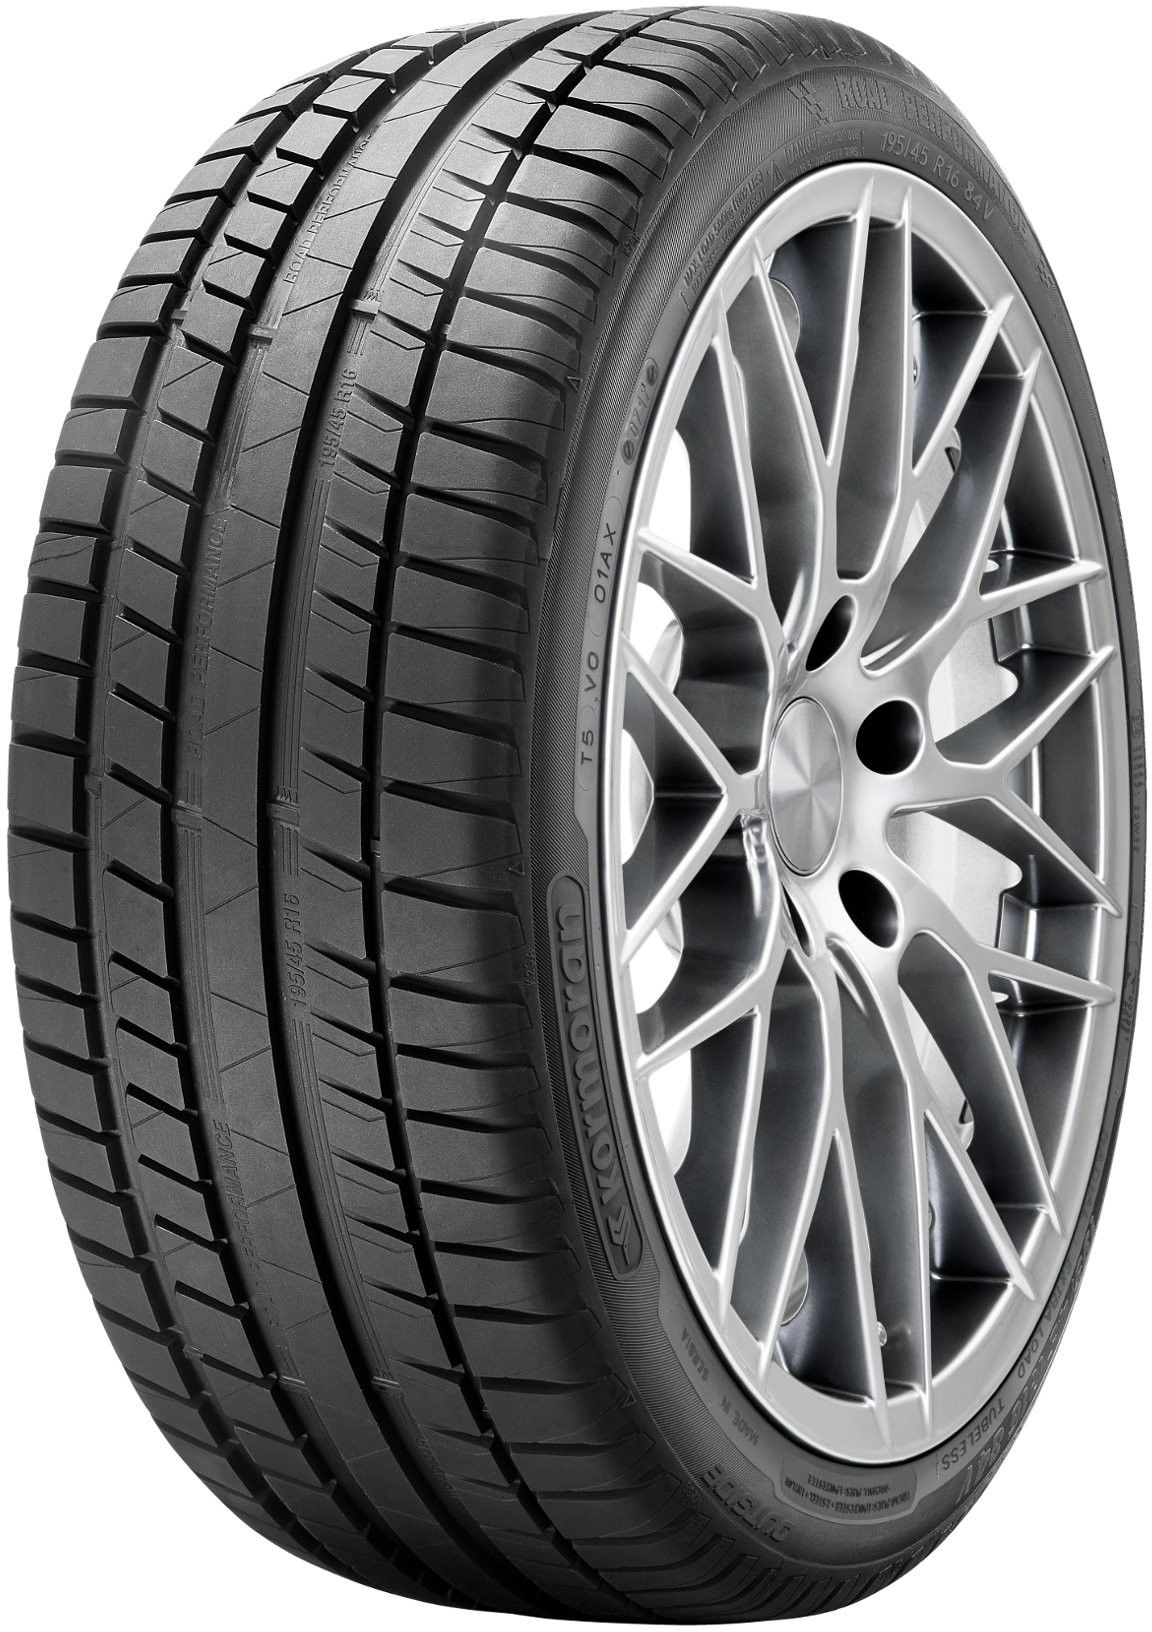 Kormoran Road Performance 205/60R16 96 V XL